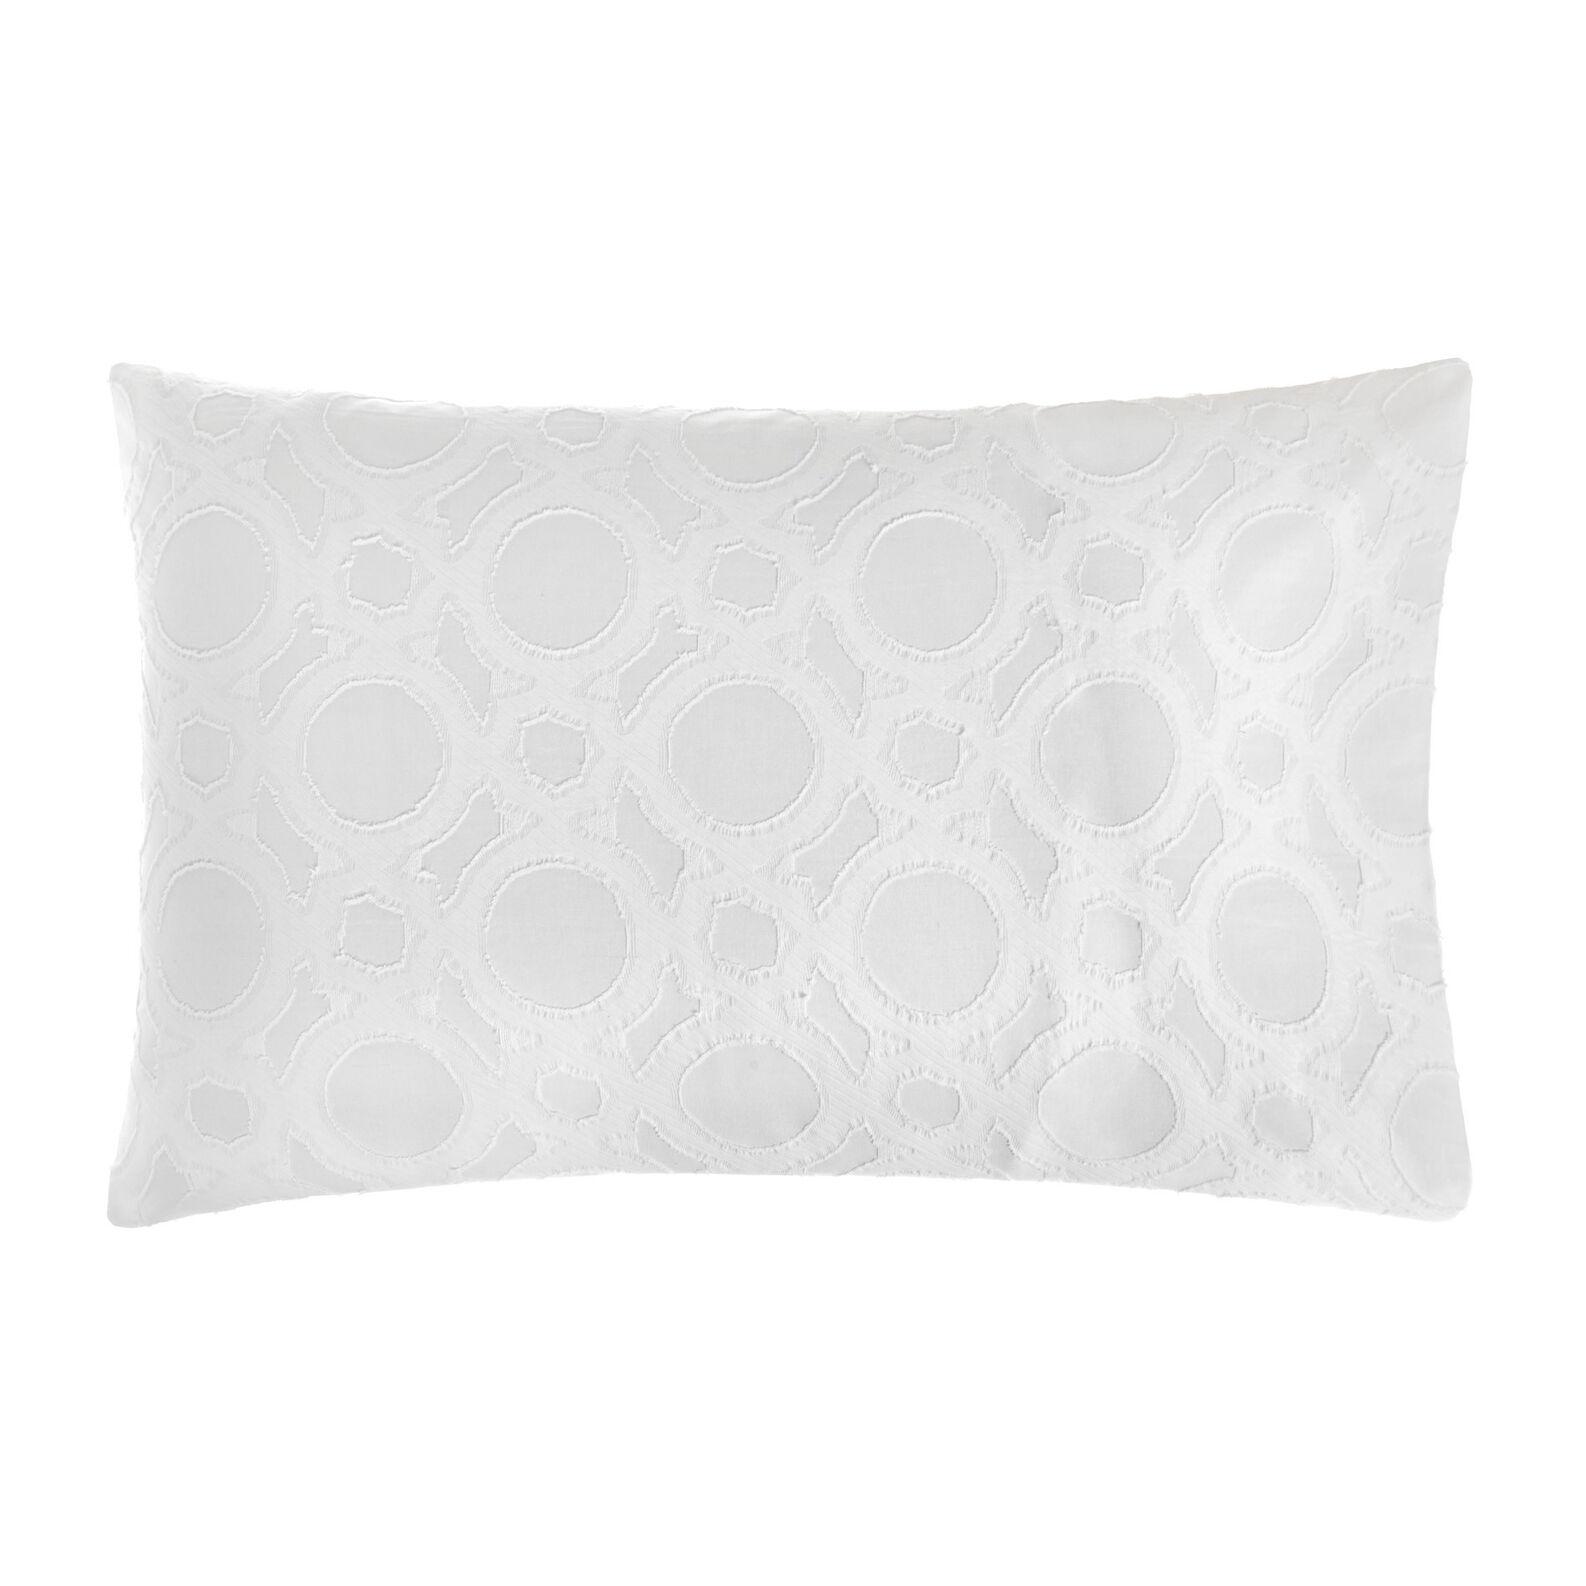 Cotton jacquard  pillowcase with circle pattern